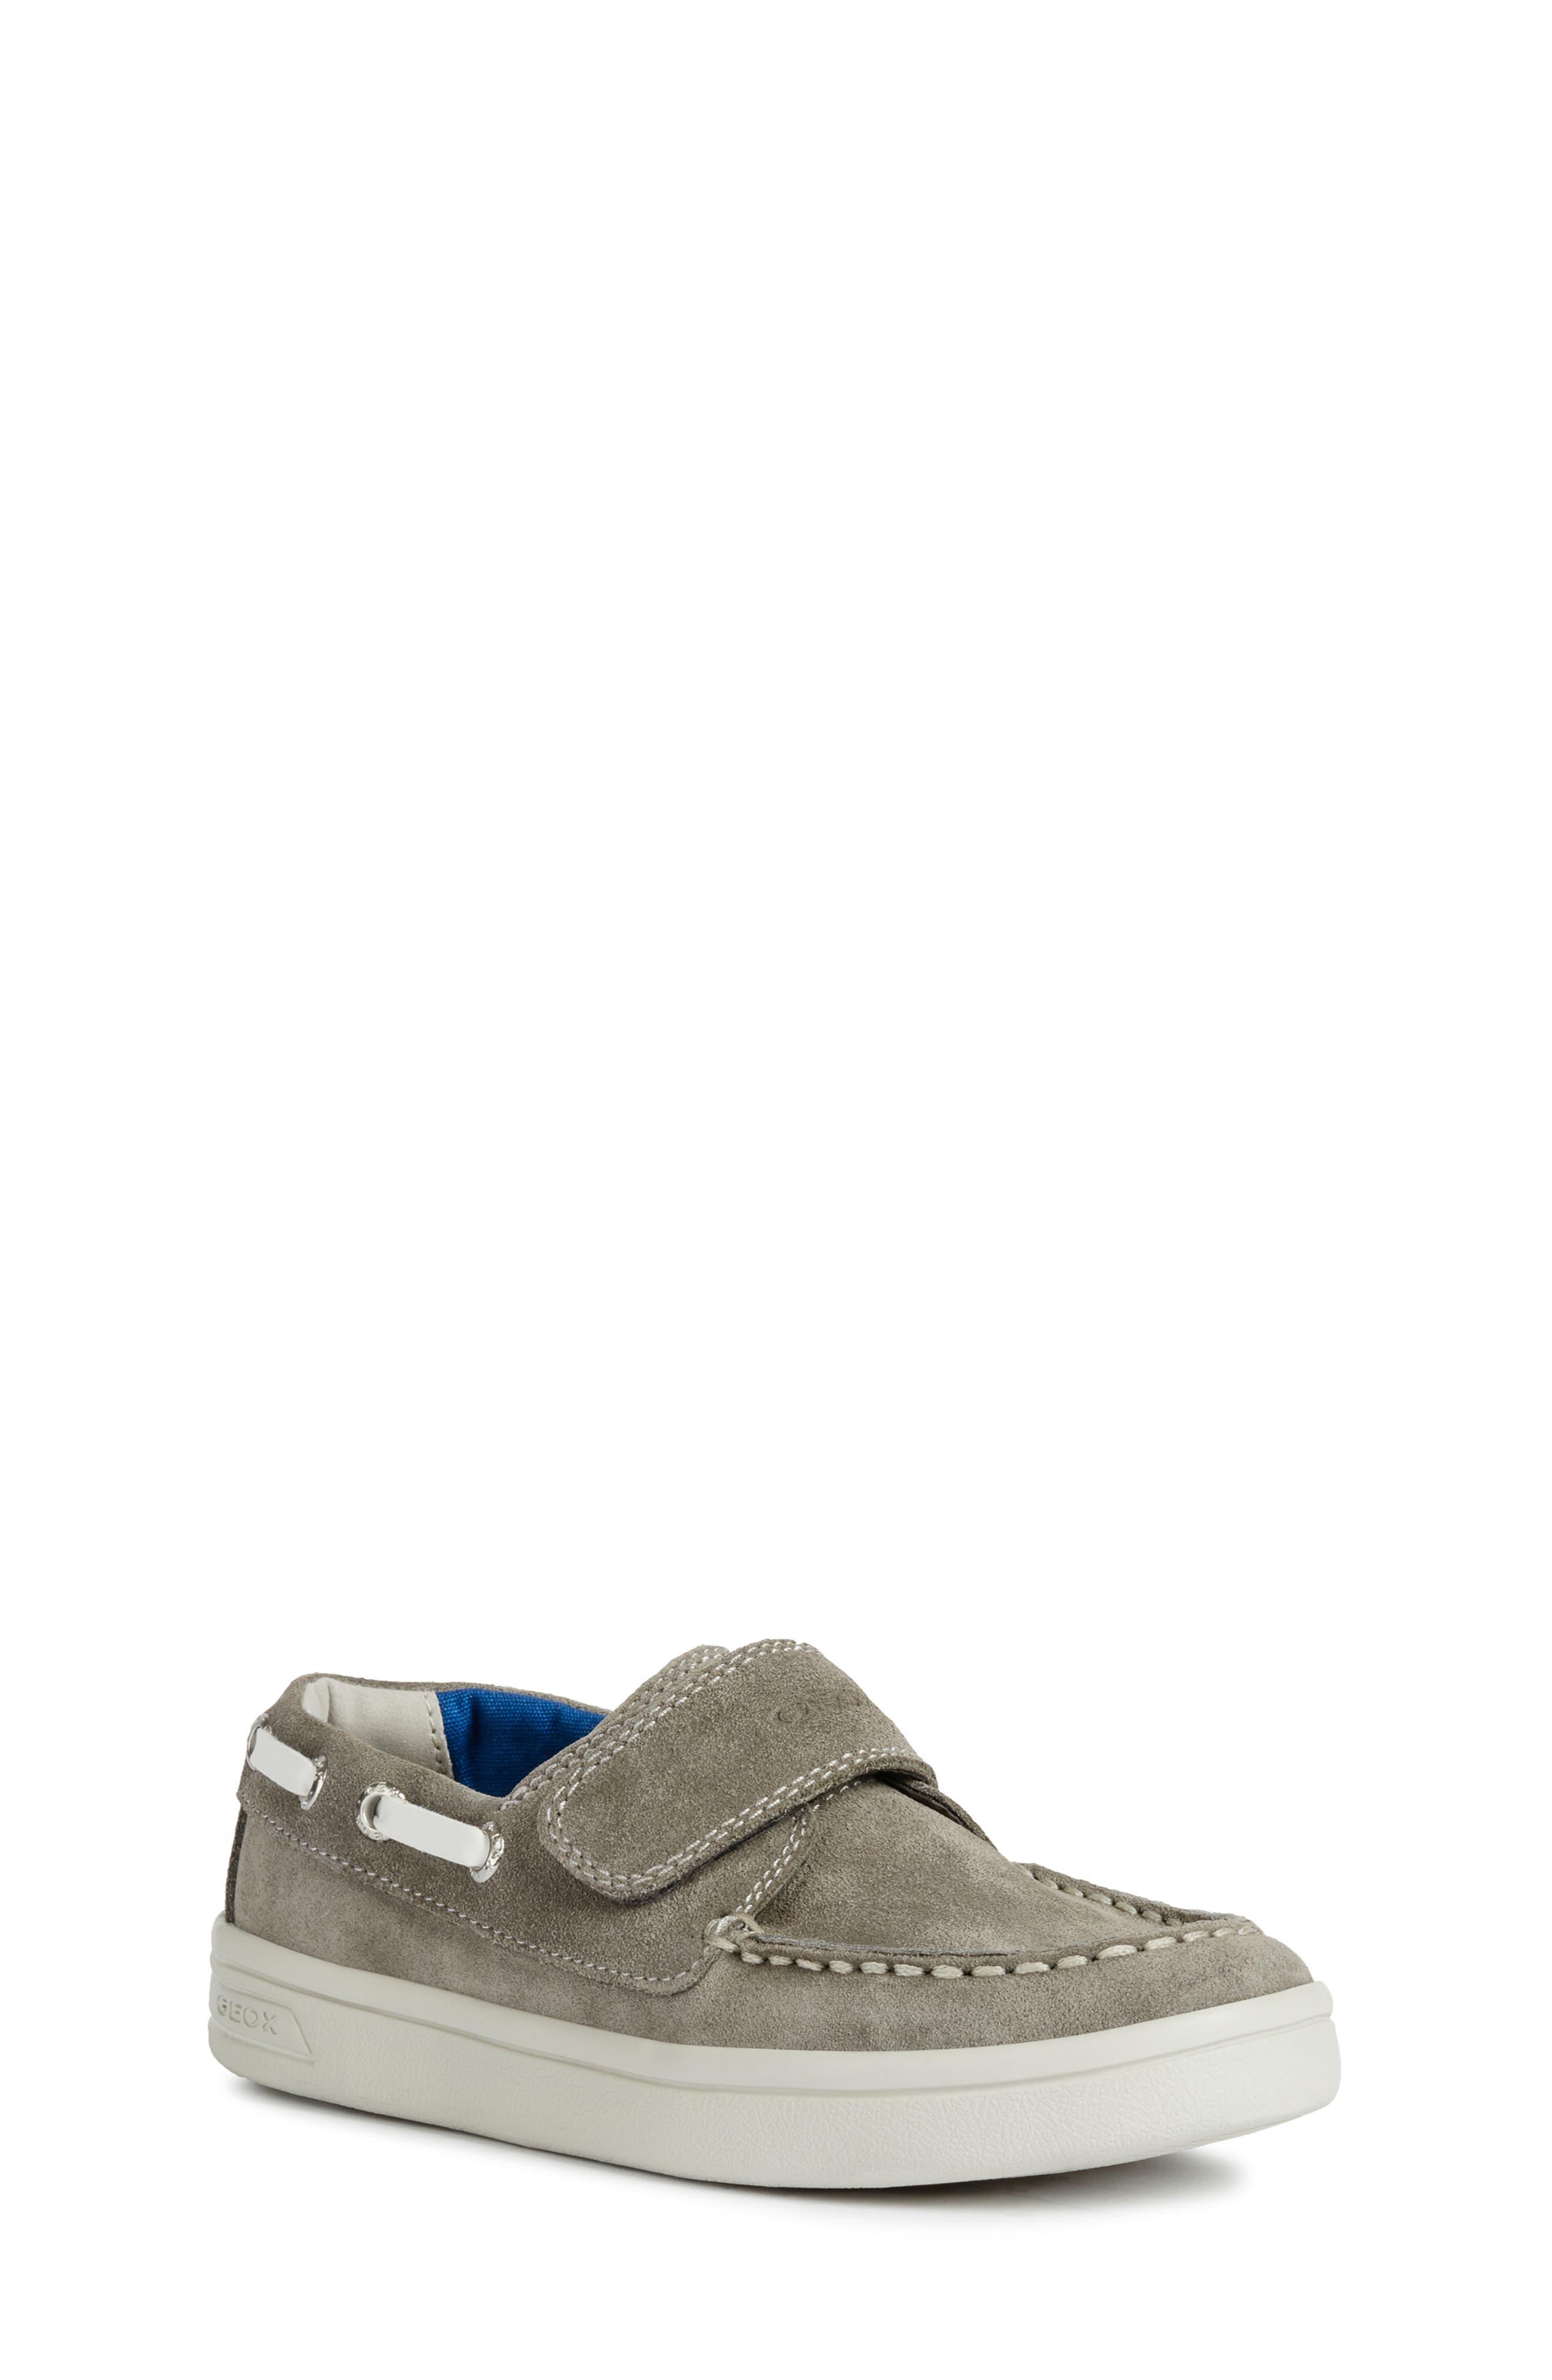 GEOX DJ Rock Boat Shoe, Main, color, GREY/ WHITE